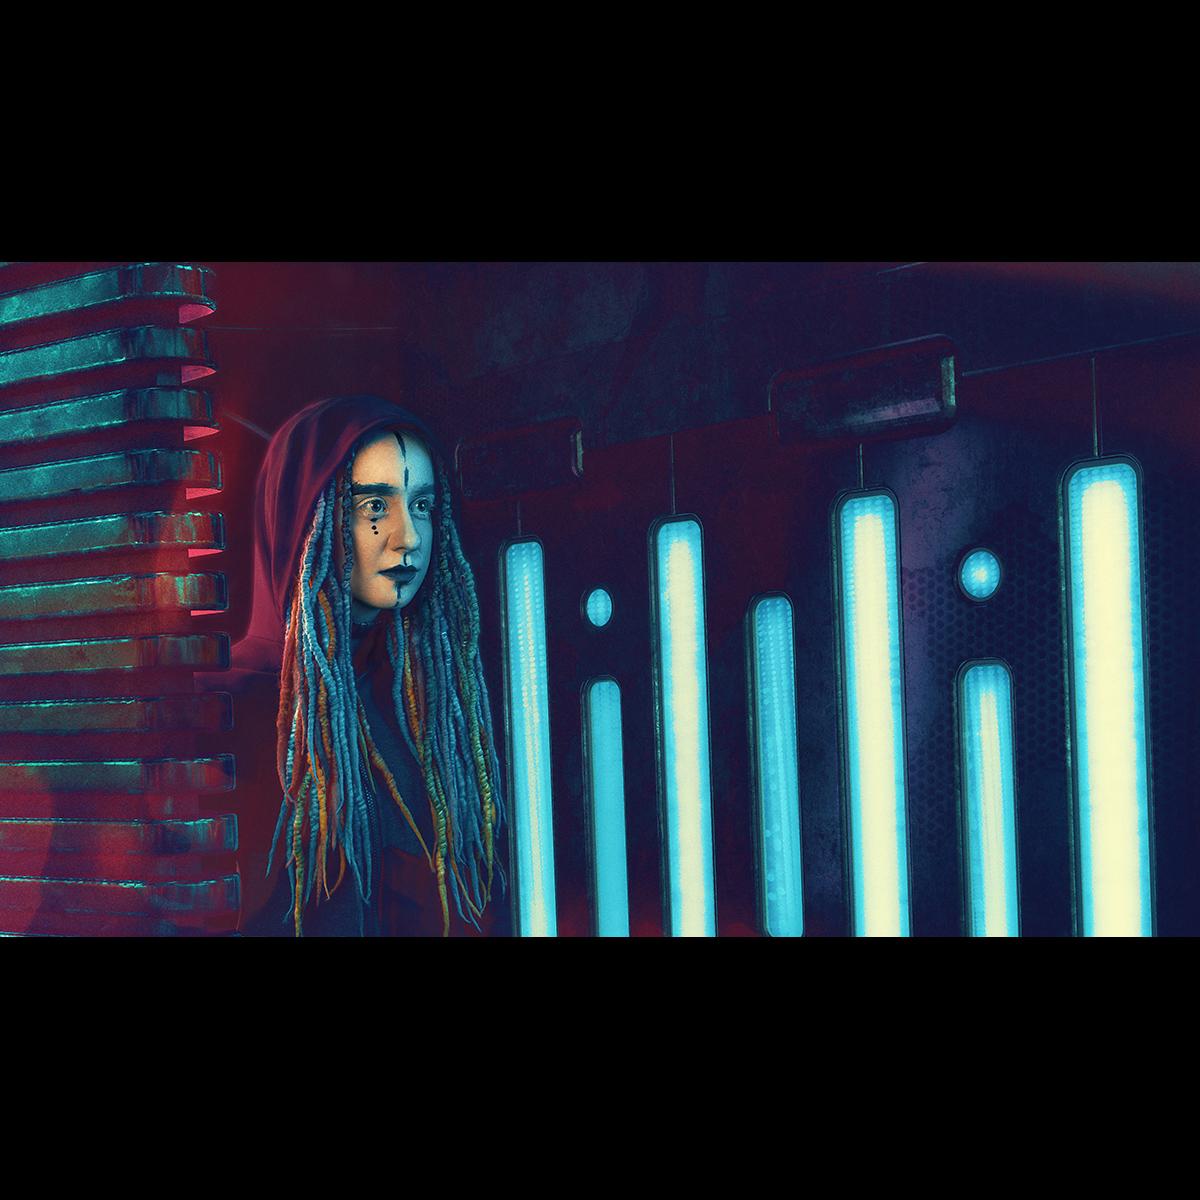 Łukasz Liszko - fotografia / CGI - modelka Sylwia Bajera - mua Małgorzata Paczuska - projektant Askasu - Cyberpunk / Blade Runner